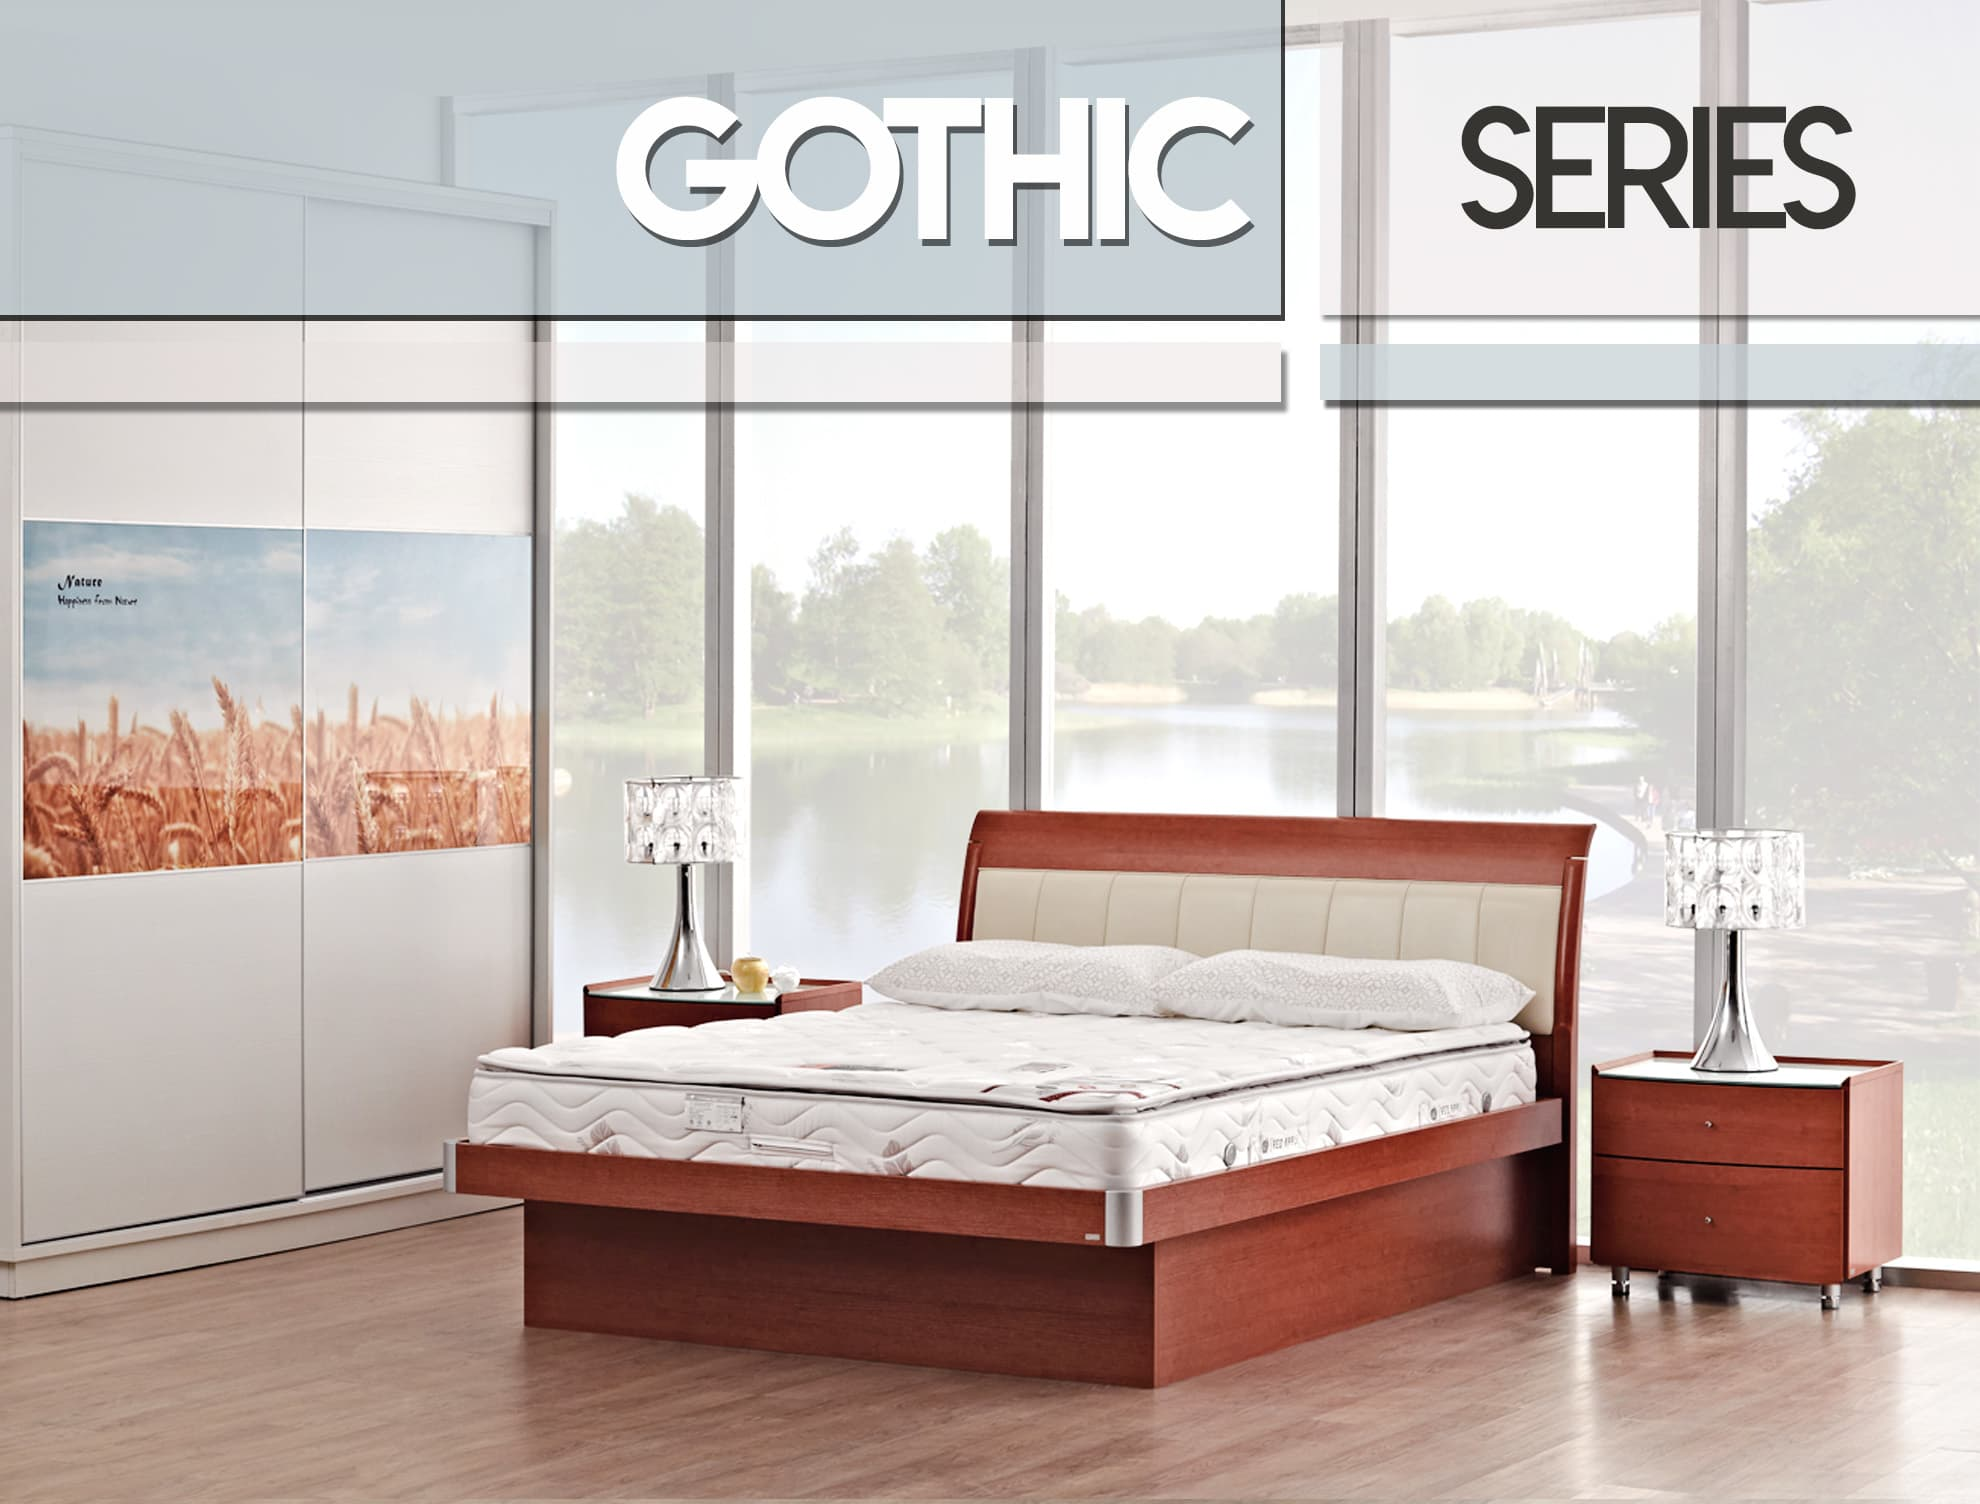 gothic_3